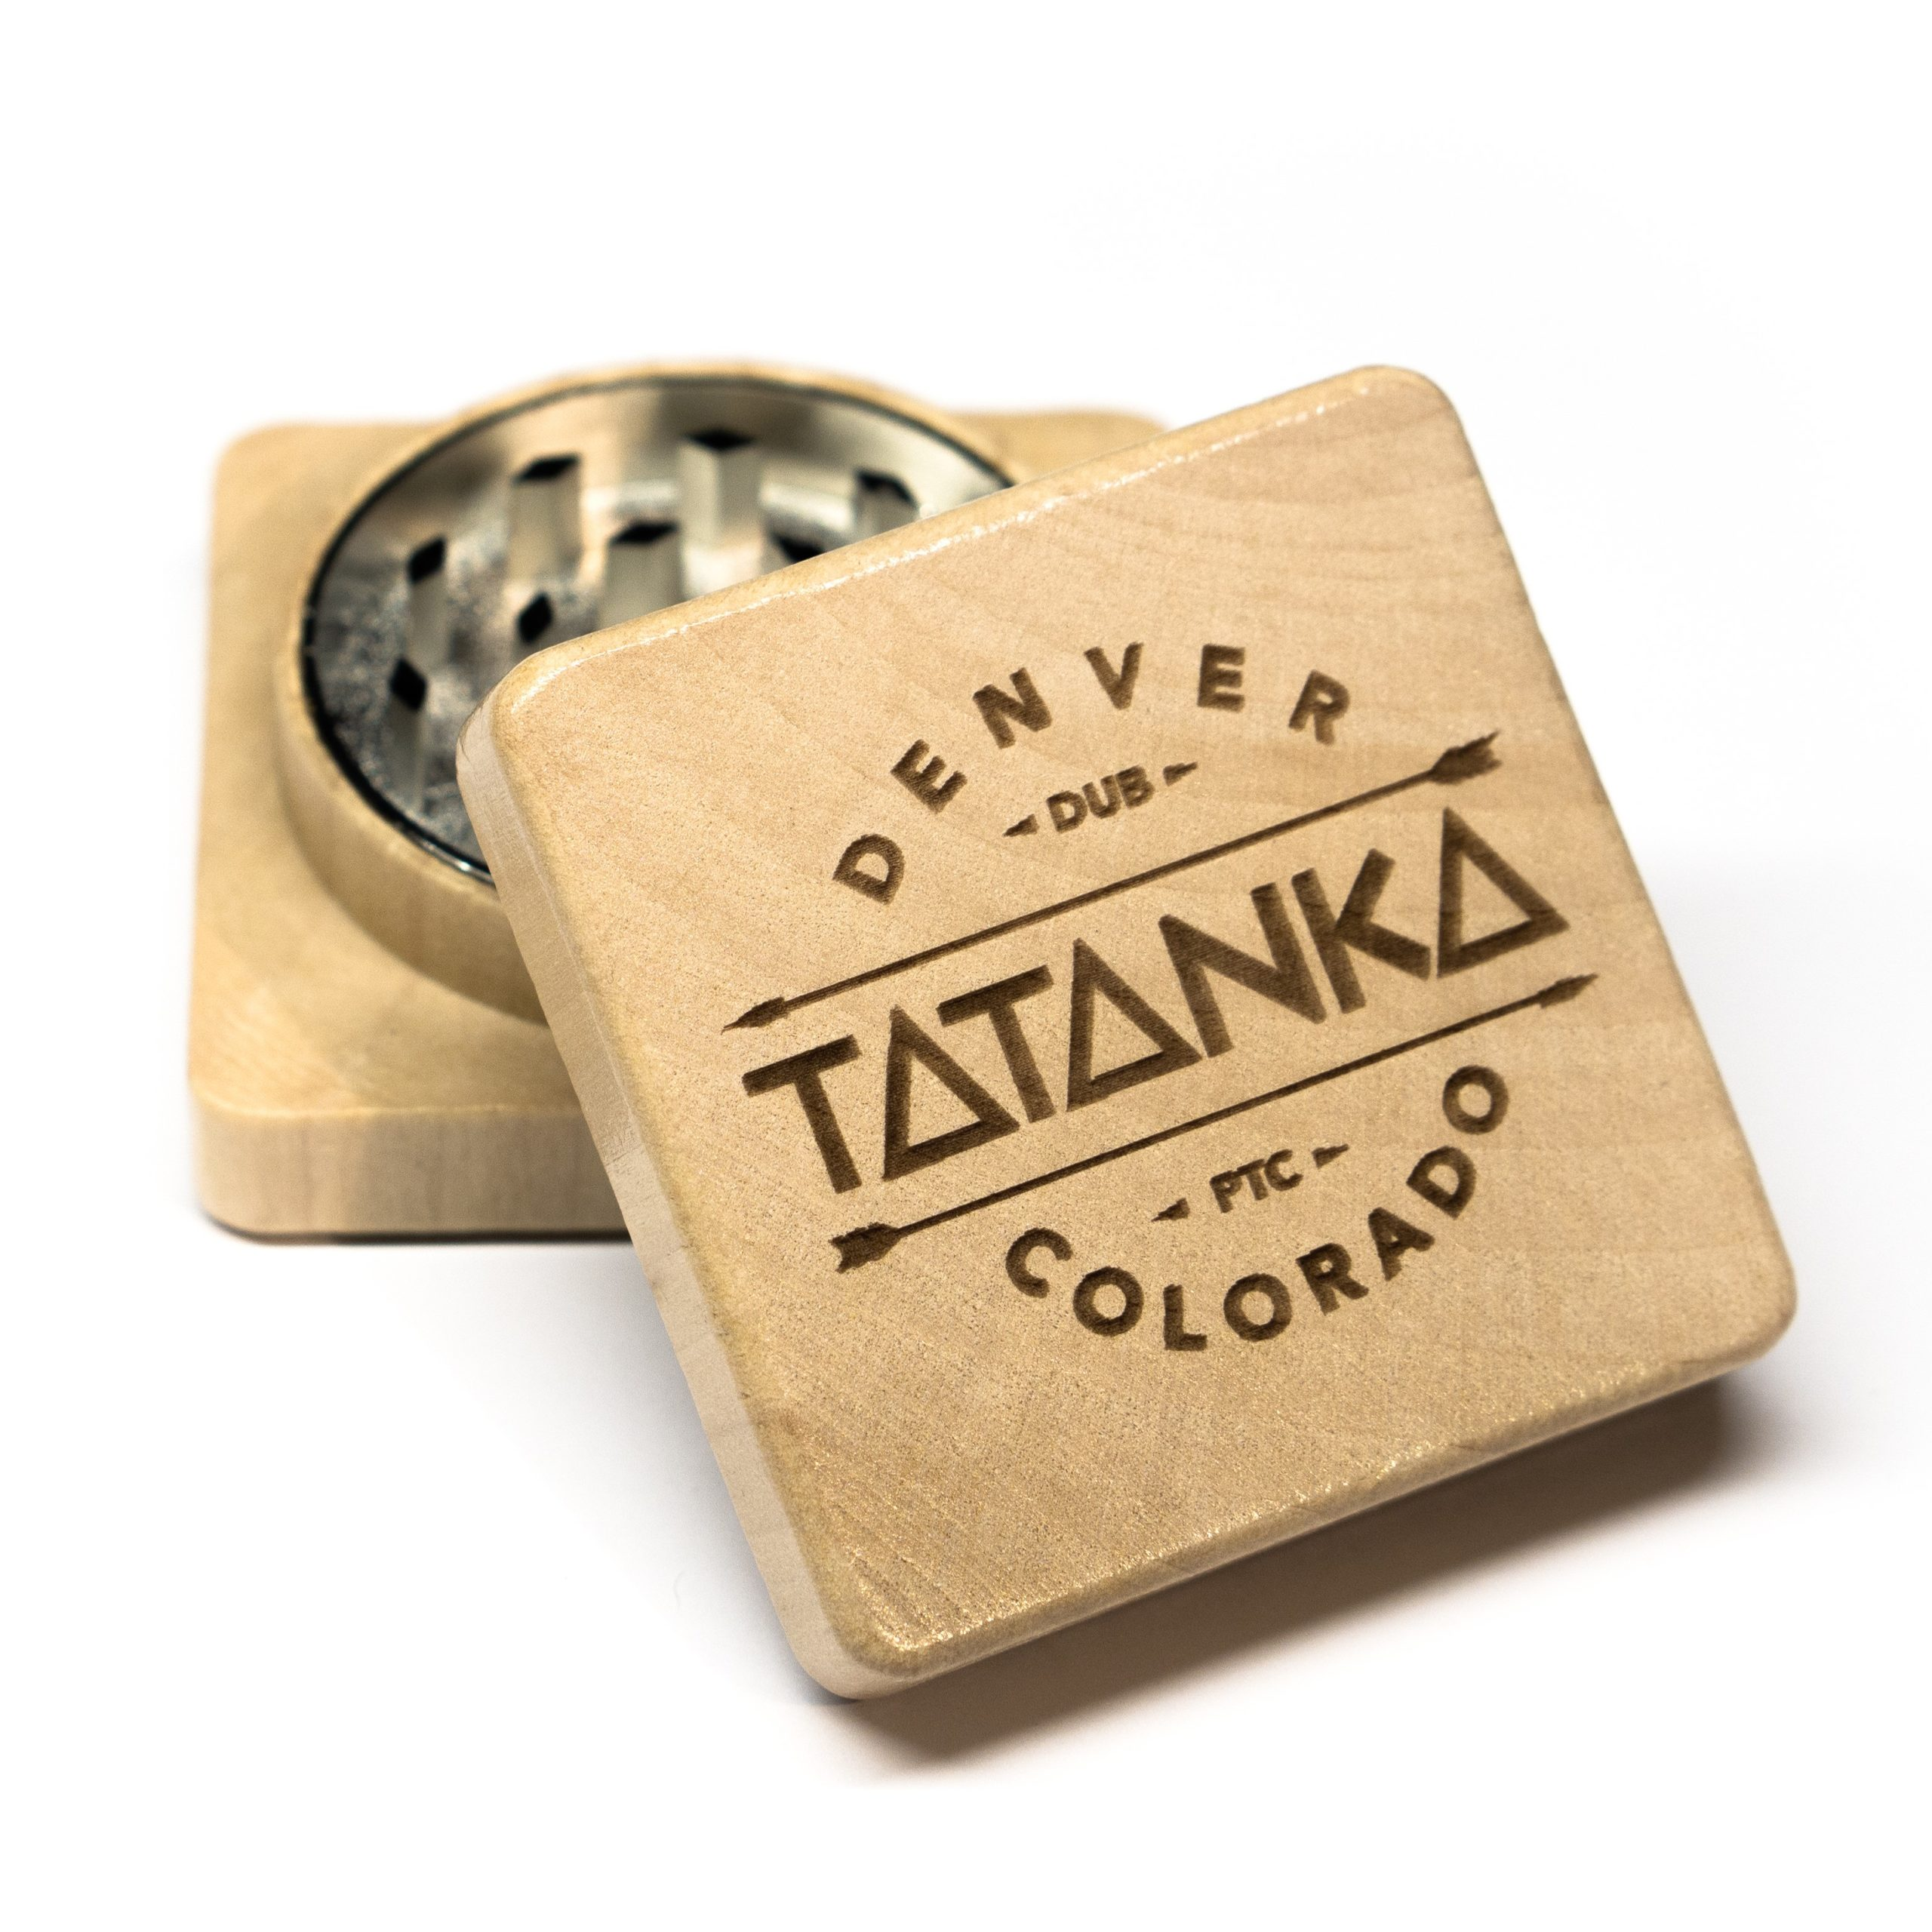 tatanka square grinder edit